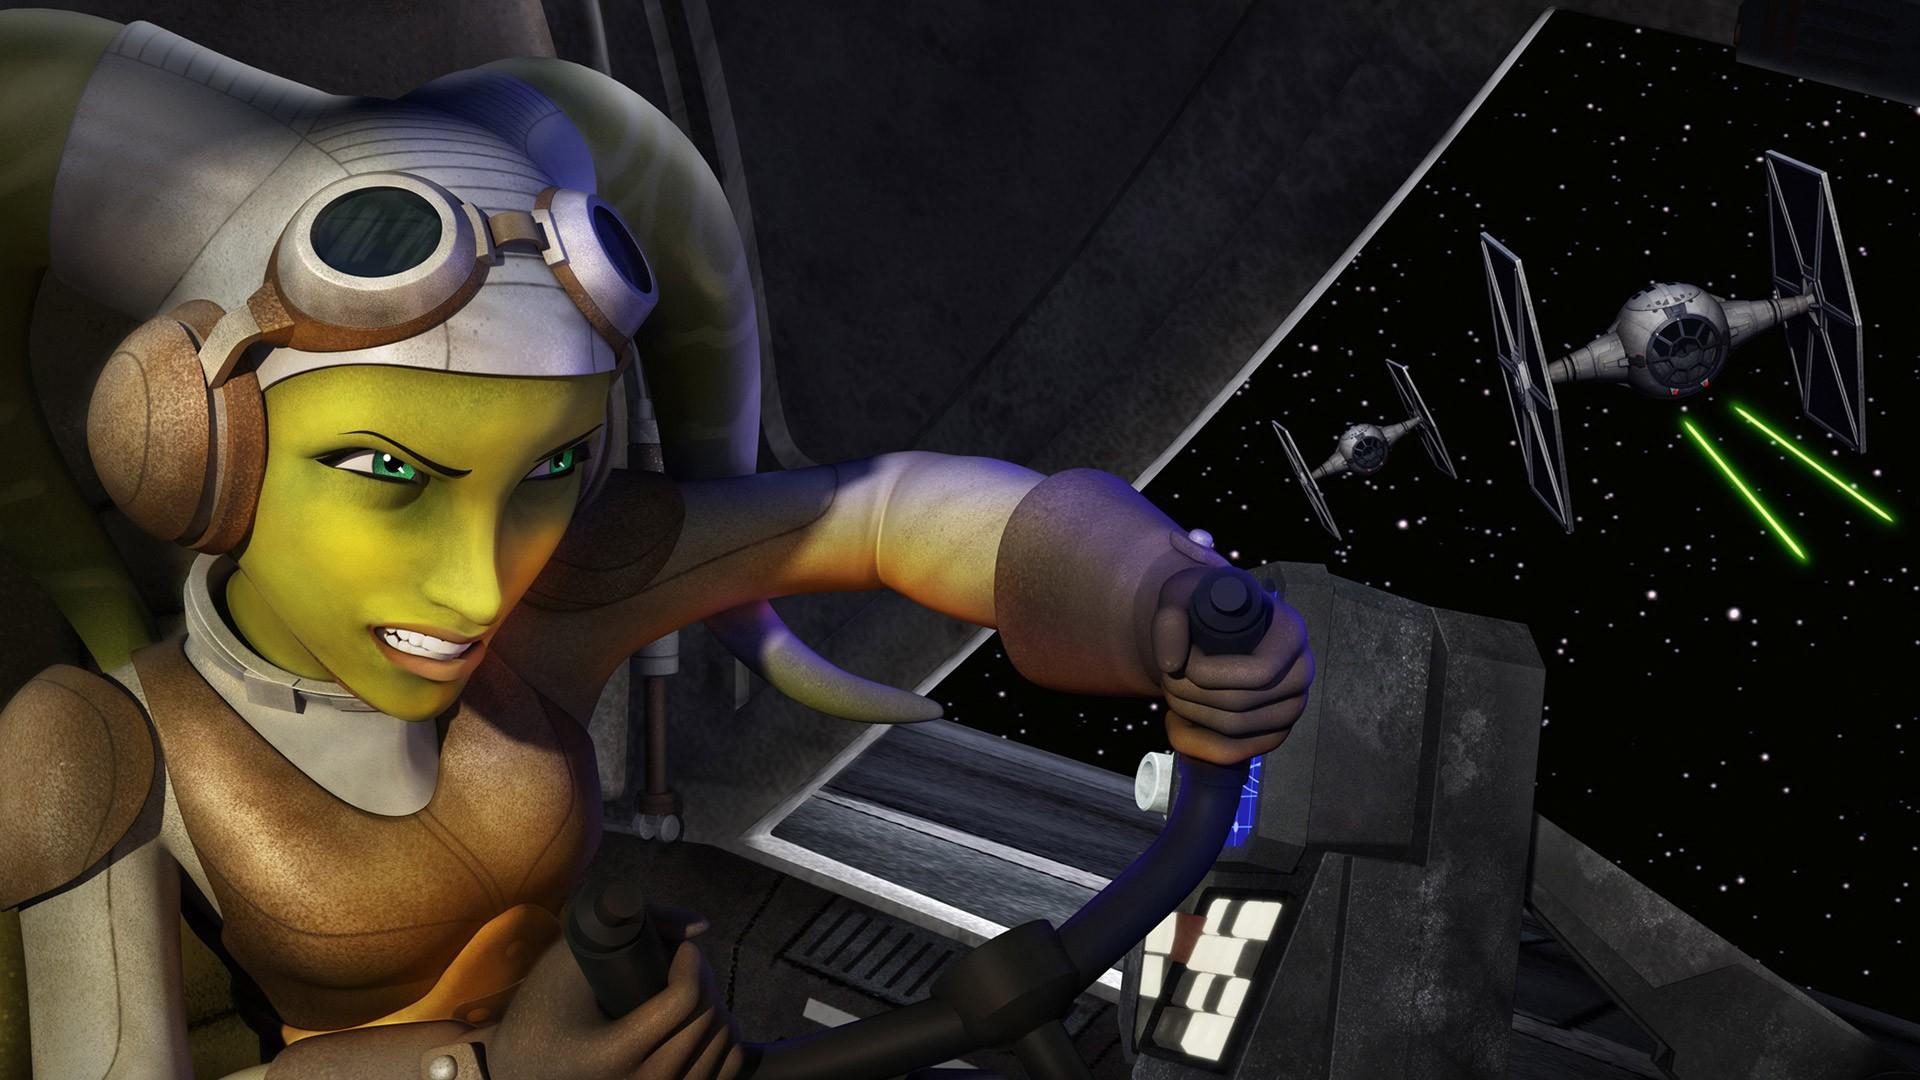 Star wars cartoon pornos video exploited photos